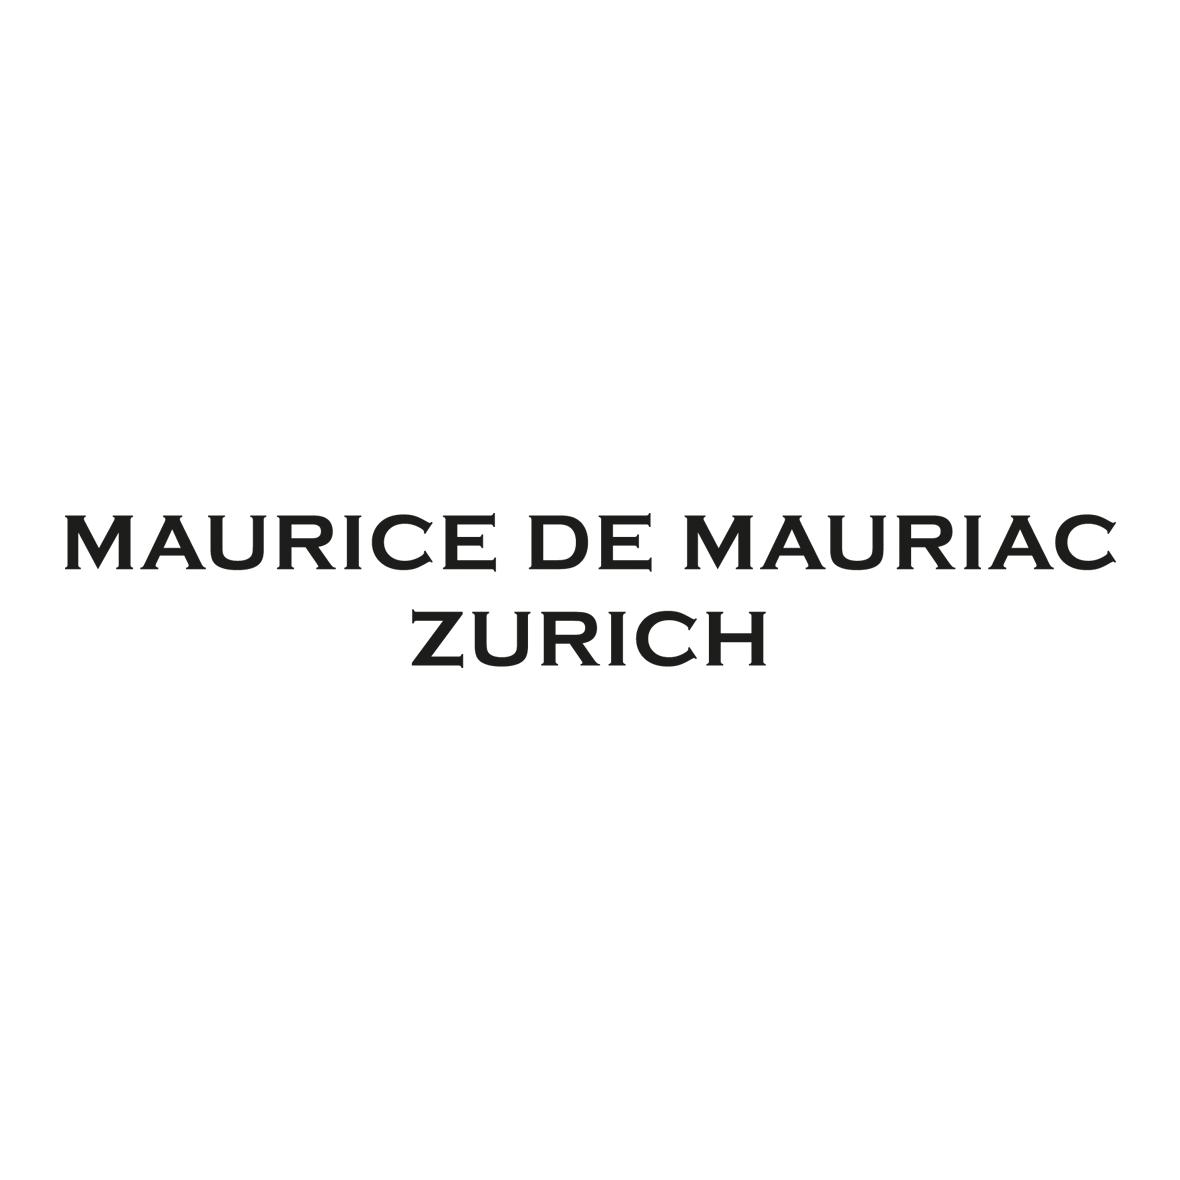 Maurice de Mauriac